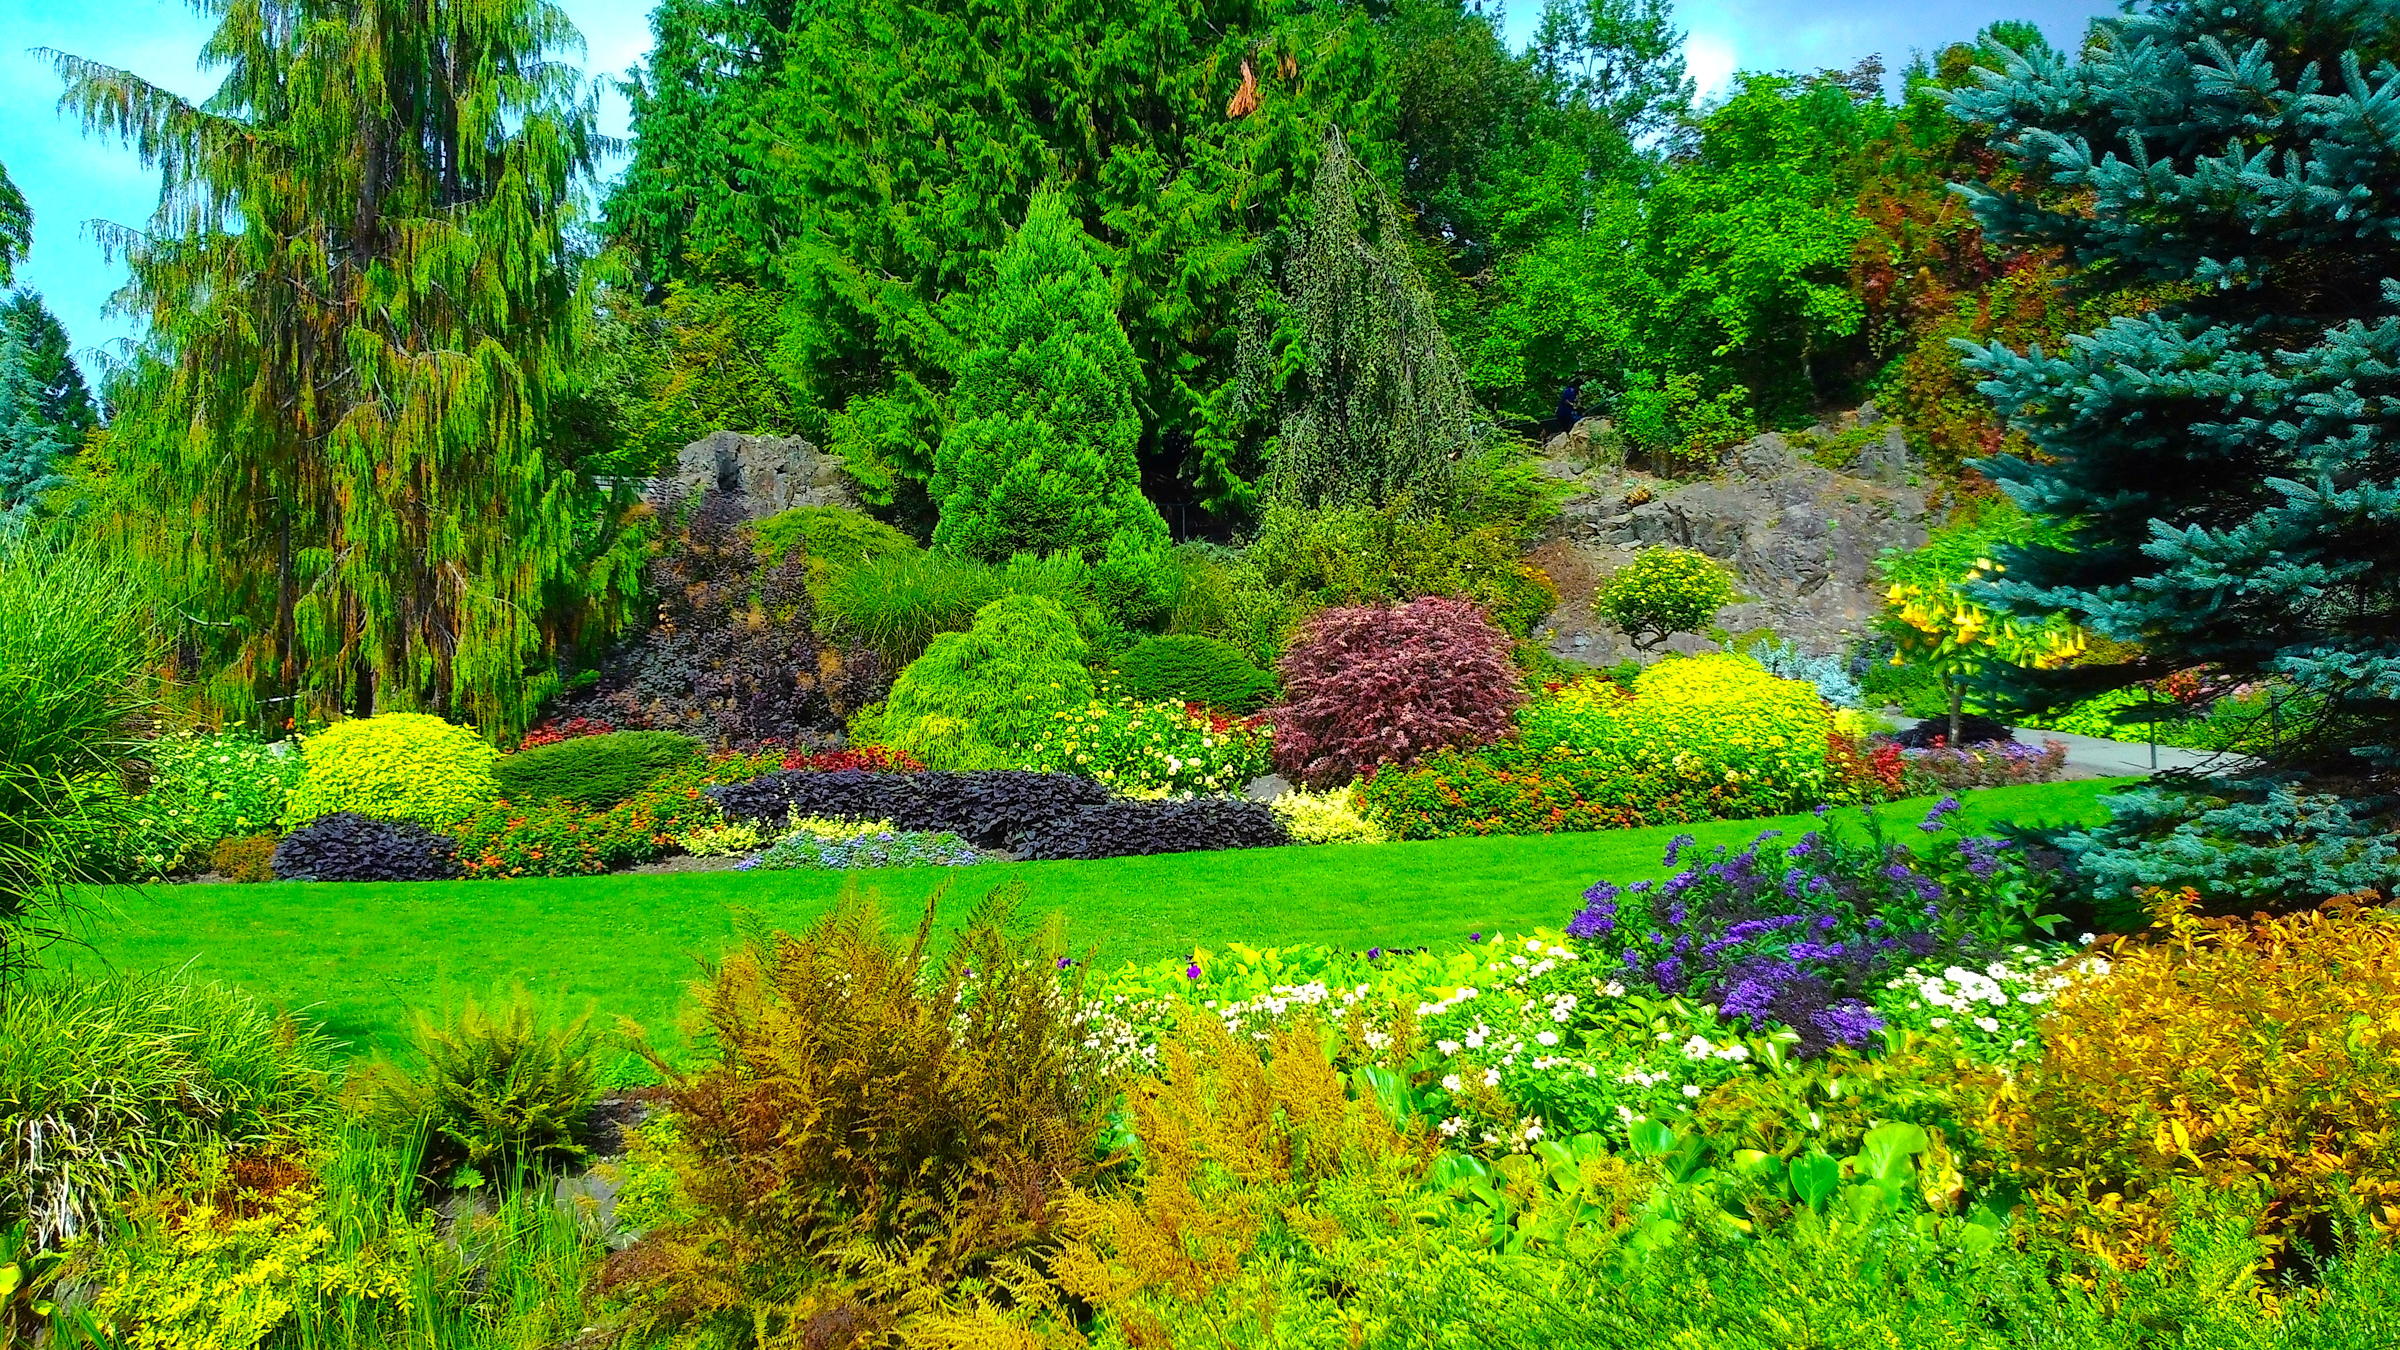 Queen Elizabeth Gardens In Canada HD Wallpaper